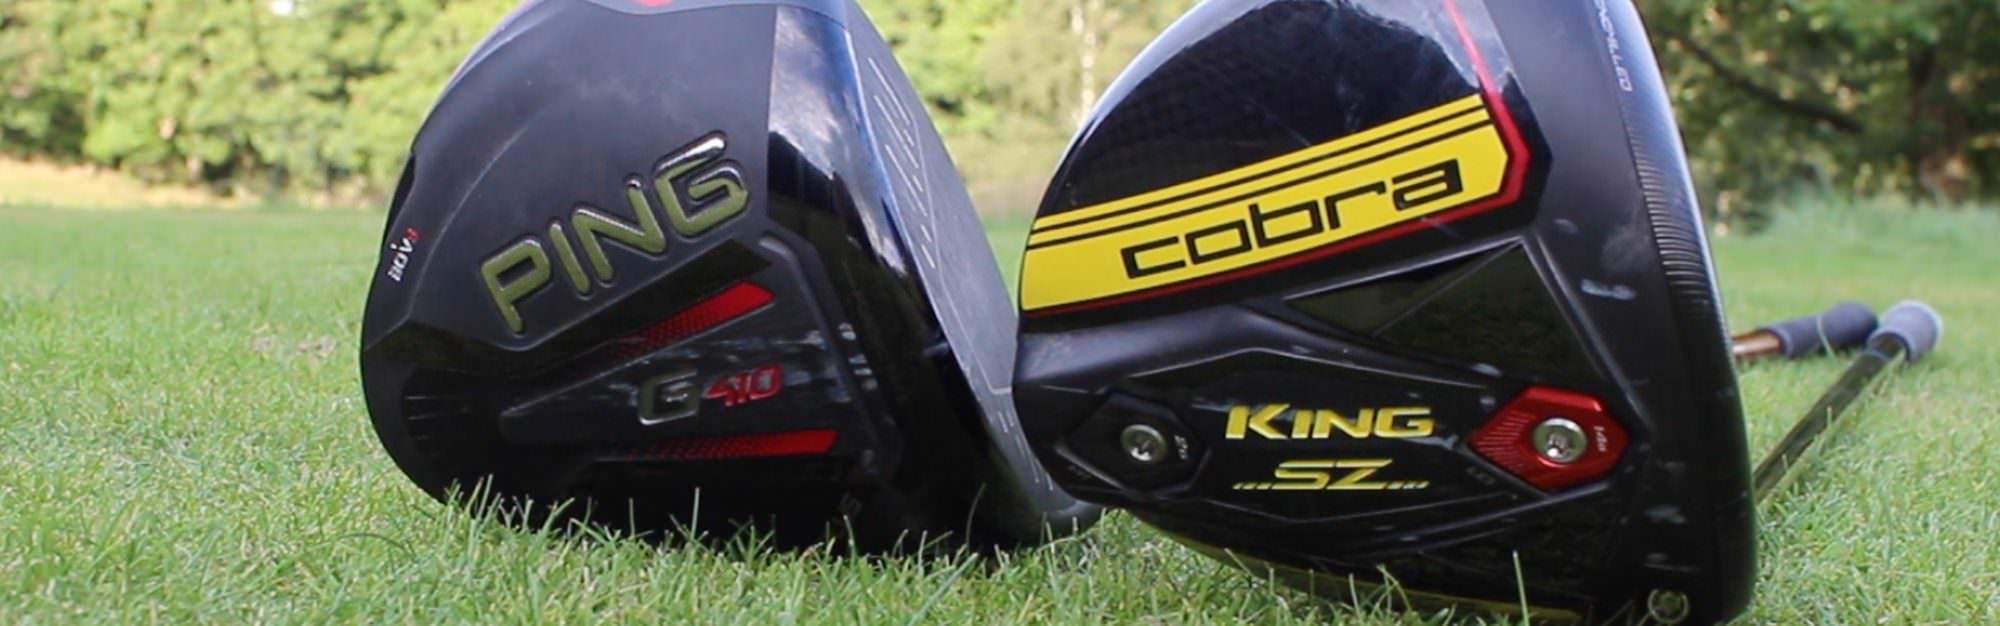 Driver World Cup: Ping G410 vs Cobra Speedzone